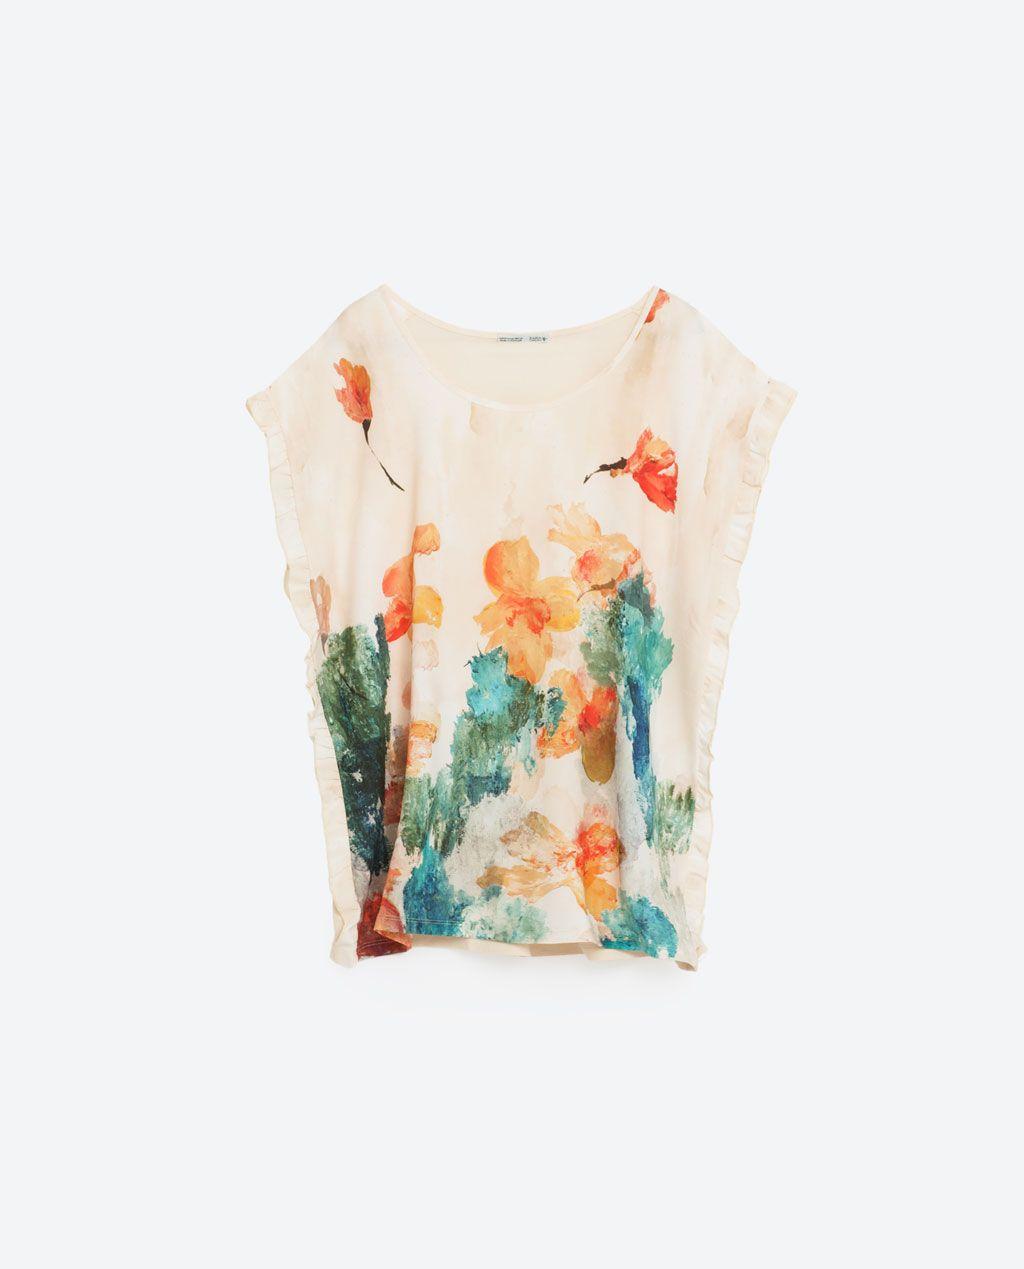 Diy Watercolor Sweatshirt Id Like It In Sky Print With Images